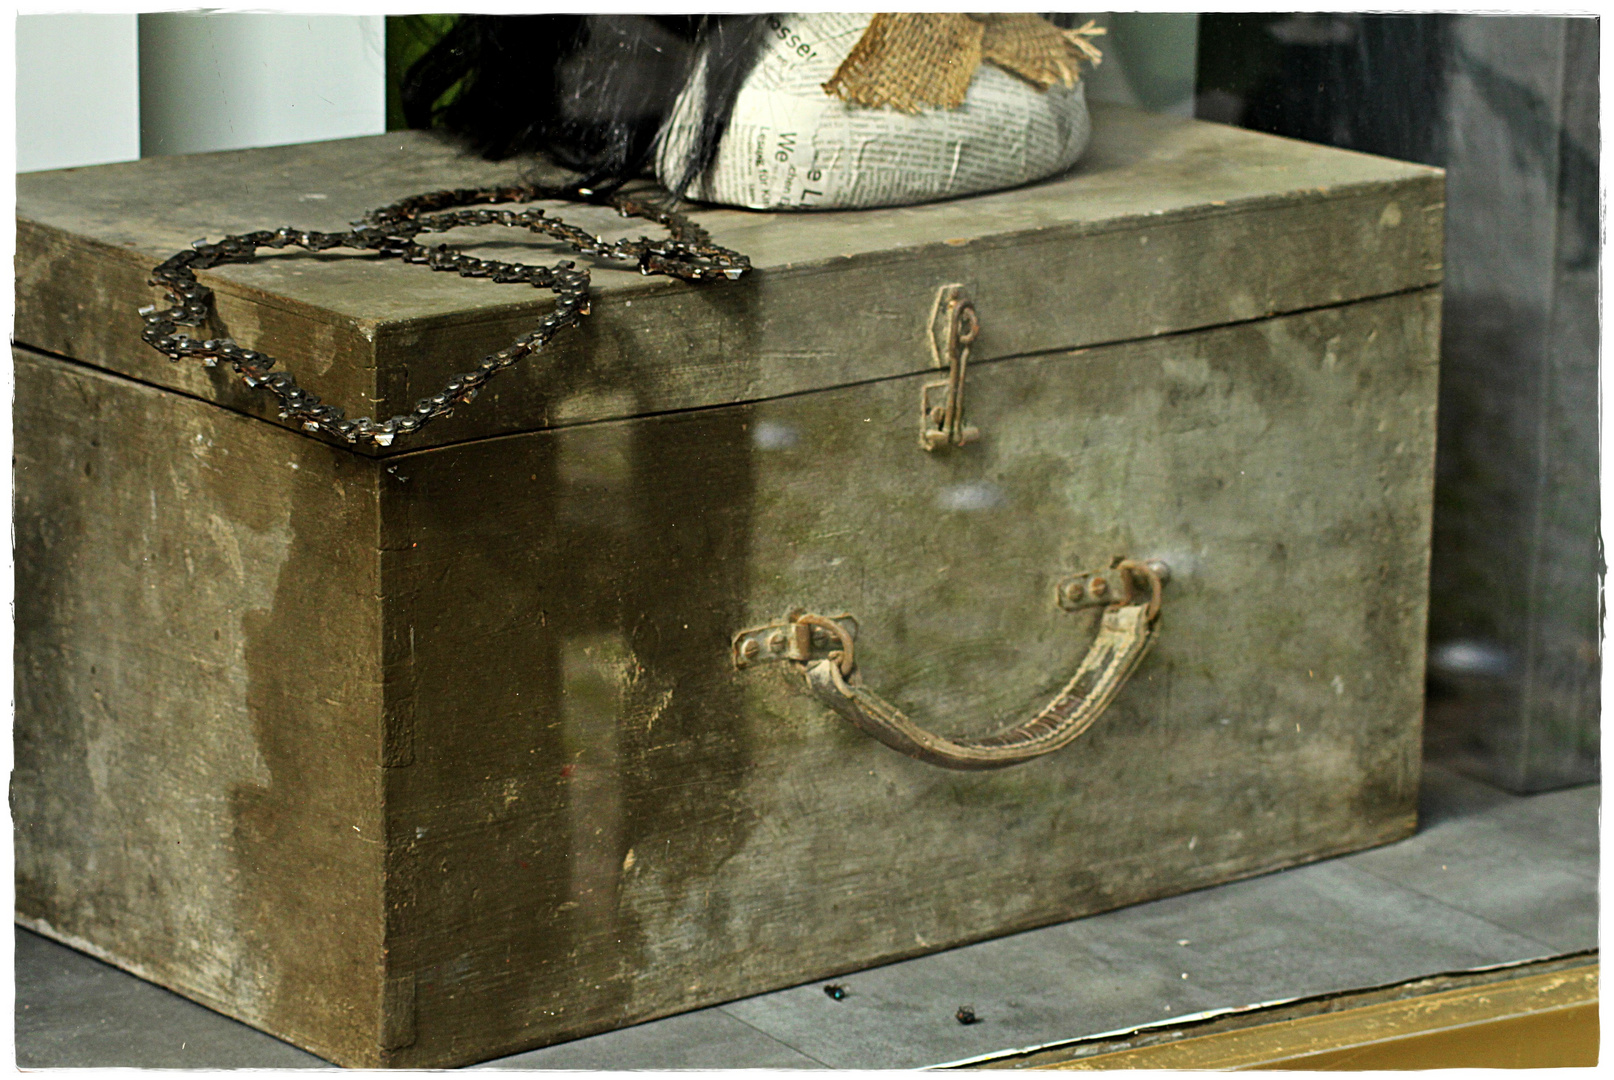 alter koffer als deko foto bild stillleben projekte. Black Bedroom Furniture Sets. Home Design Ideas